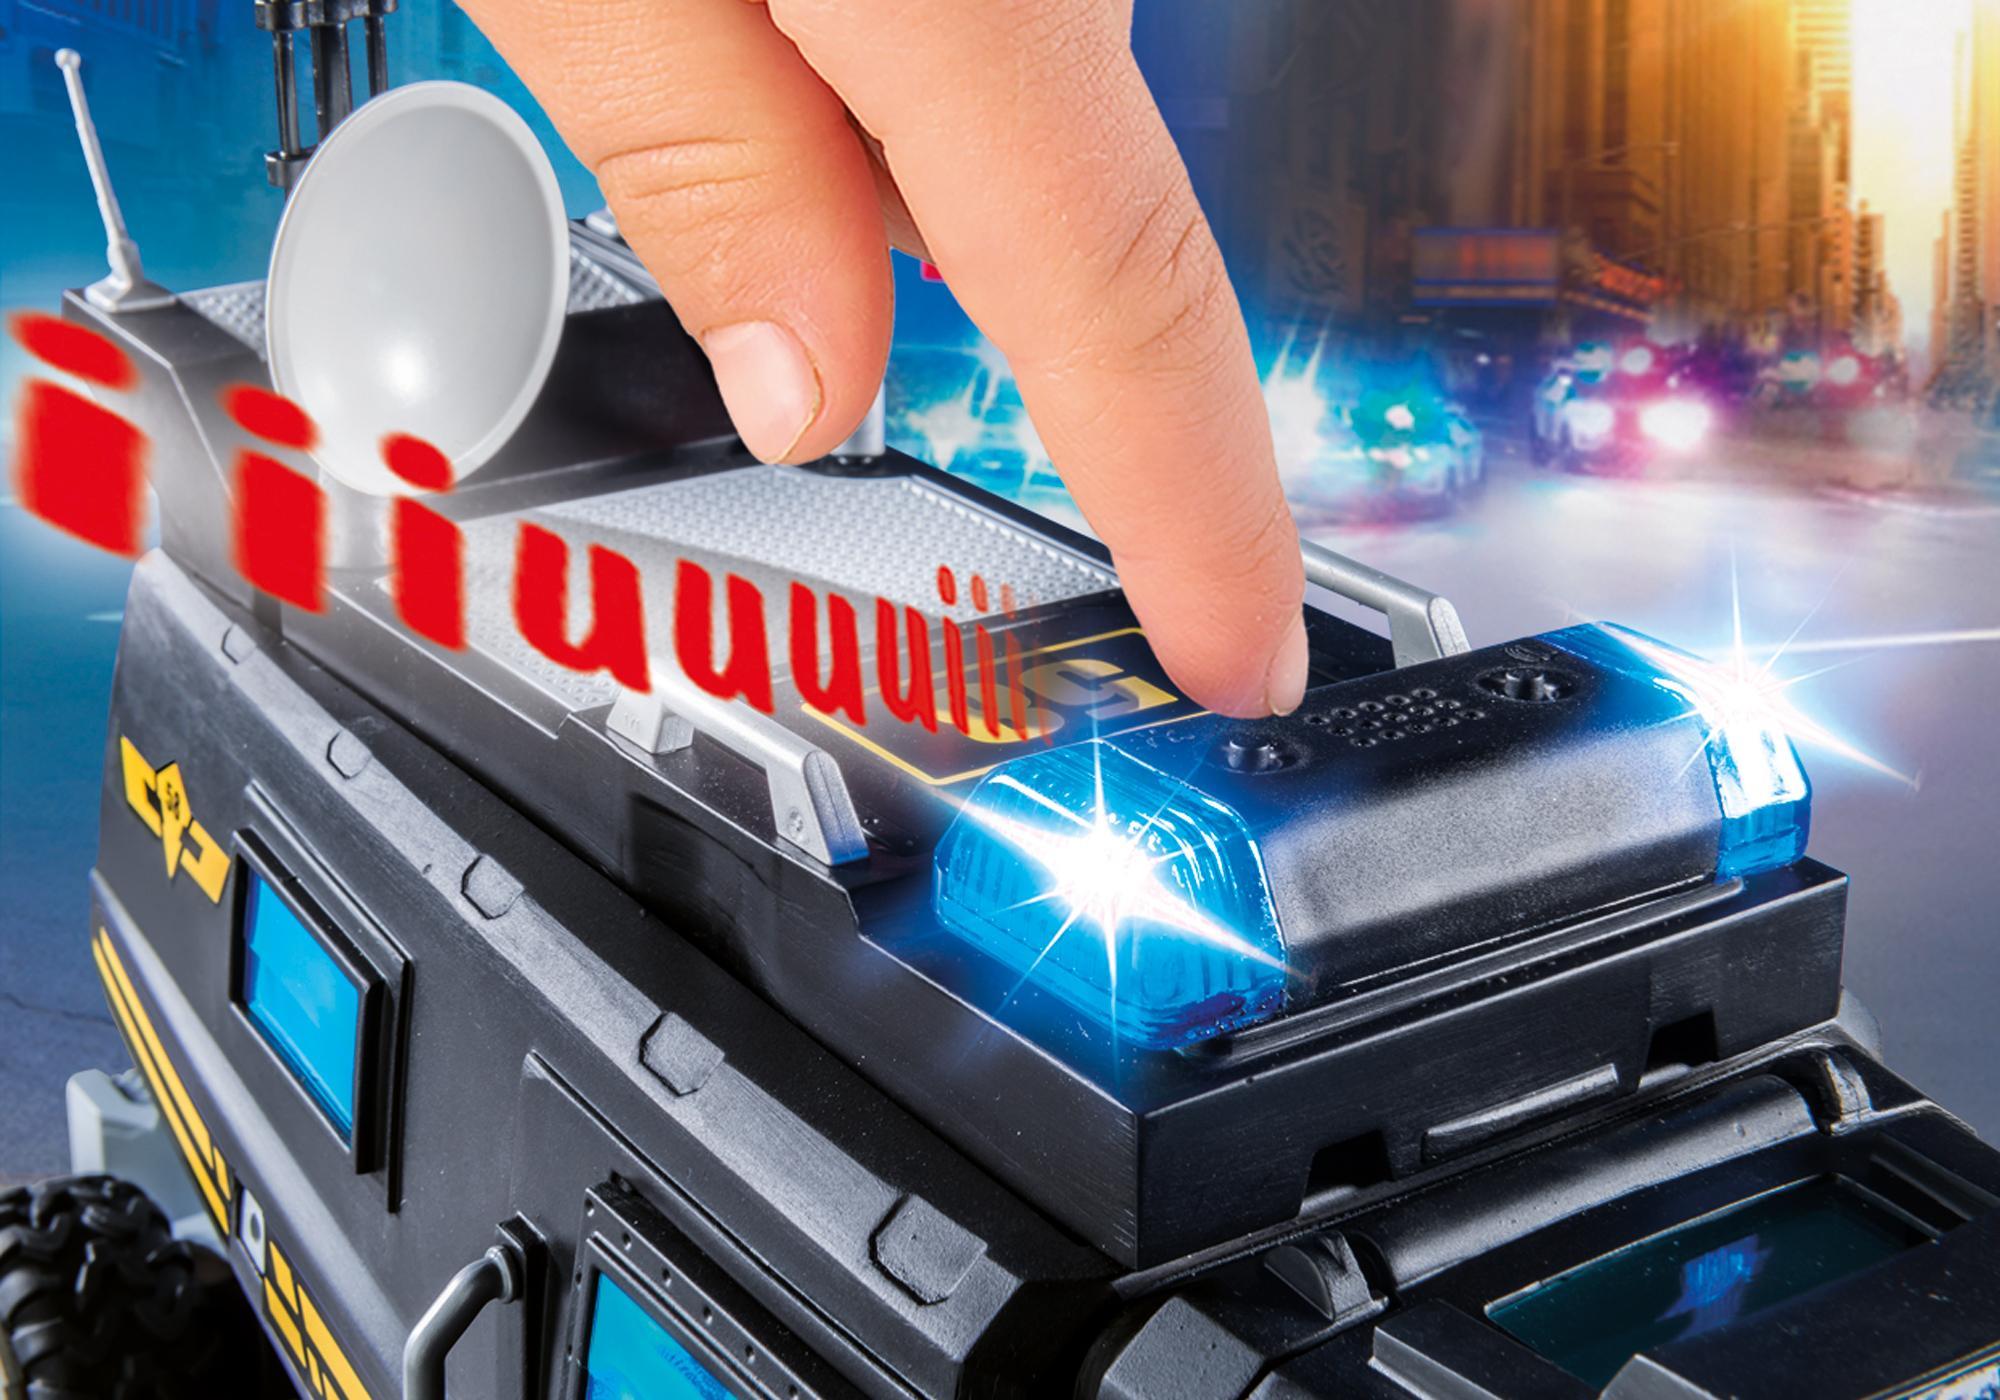 http://media.playmobil.com/i/playmobil/9360_product_extra1/Vehículo con luz LED y módulo de sonido